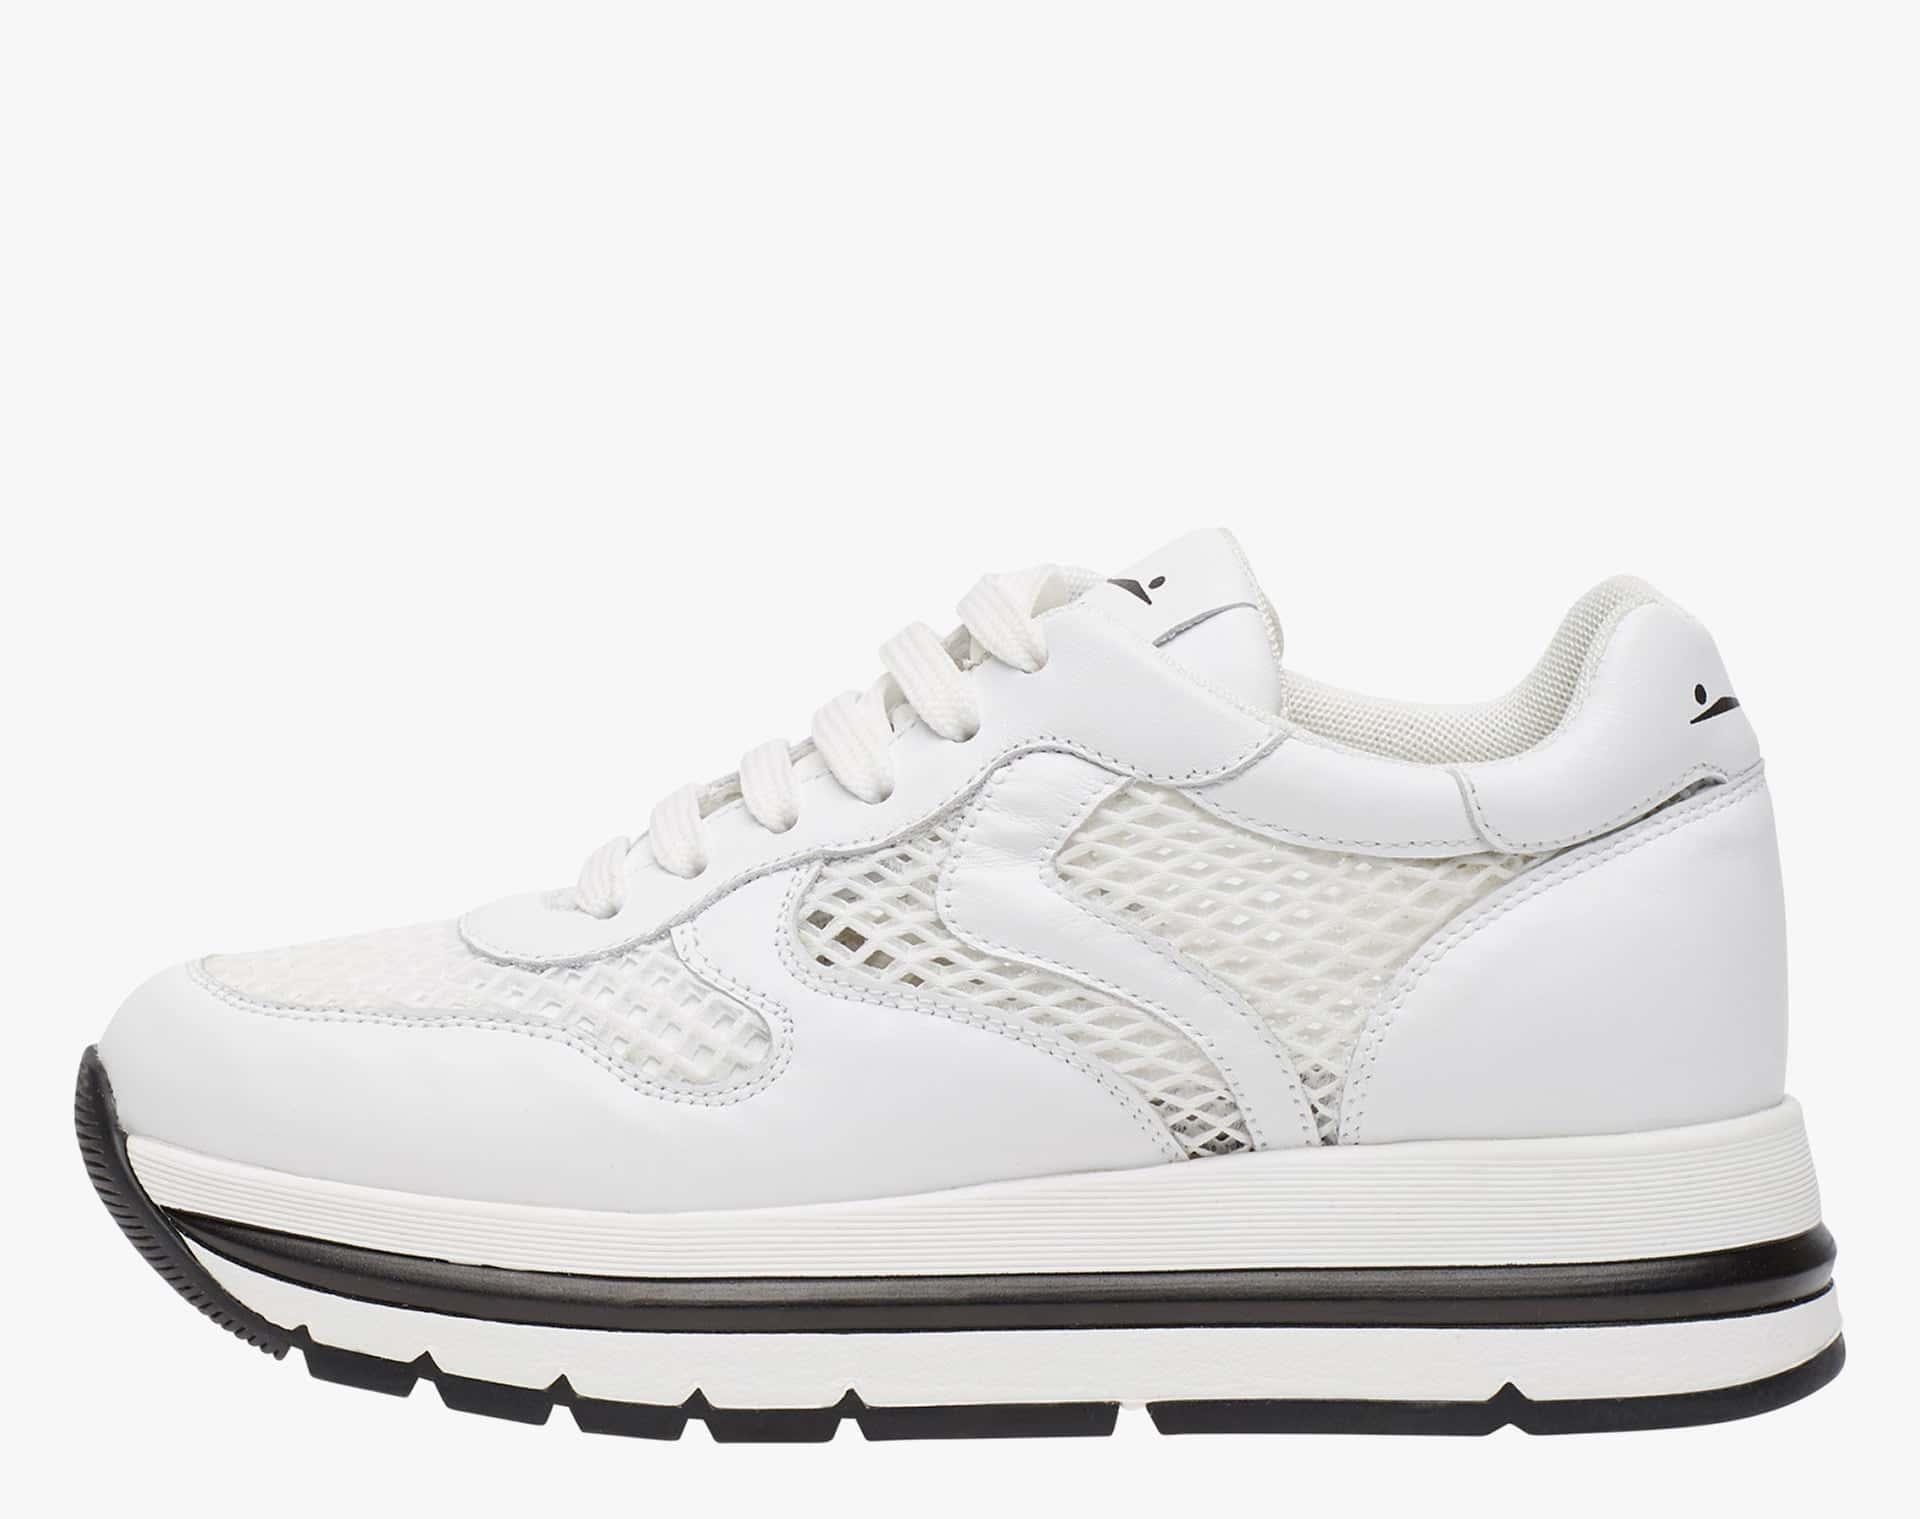 MARAN MESH - Sneaker in vitello e tessuto a rete - Bianco